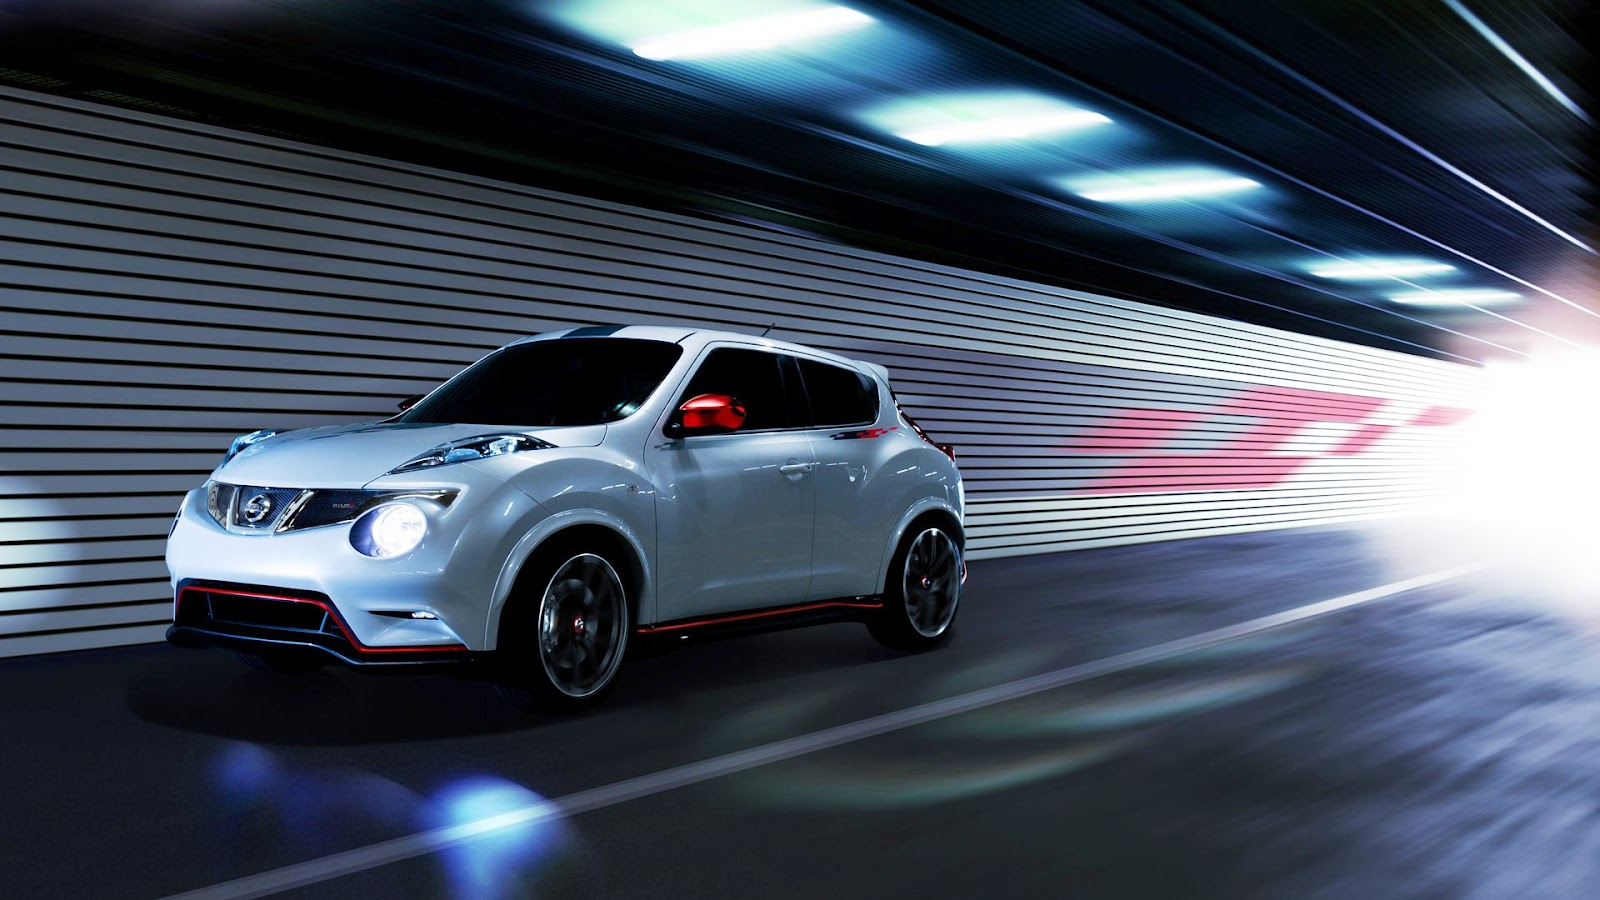 http://1.bp.blogspot.com/-D_GjJRygNuc/T83iMzoNtUI/AAAAAAAABIc/P2QNE0Fa_pE/s1600/Nissan+Juke+Nismo+Concept+01.jpg